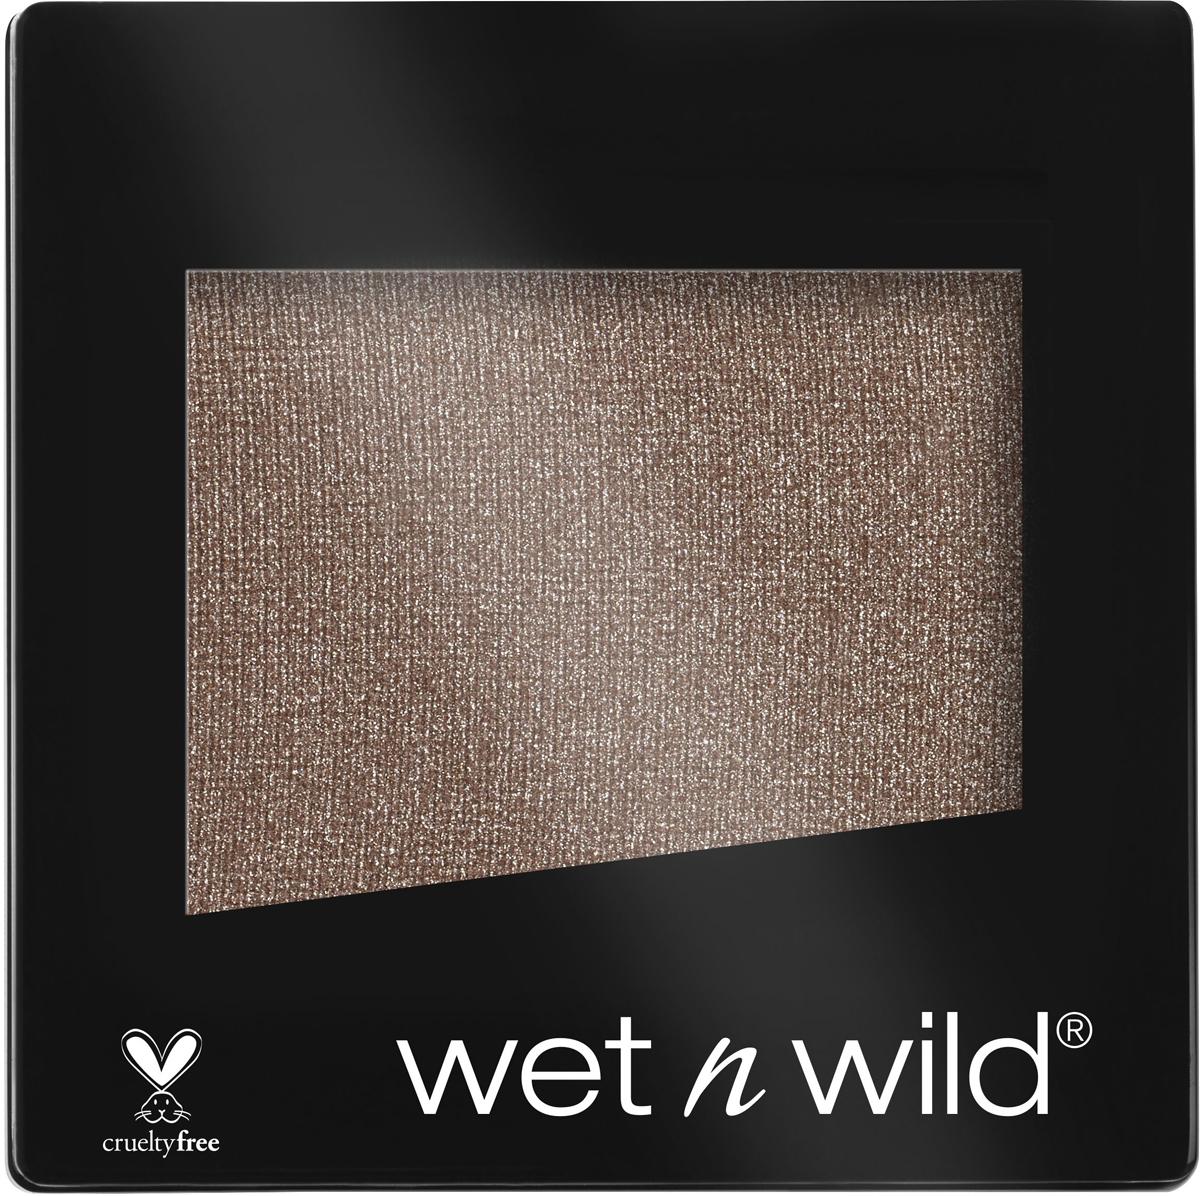 Wet n Wild Тени для век одноцветные Color Icon Eyeshadow Single, тон Nutty, E343a